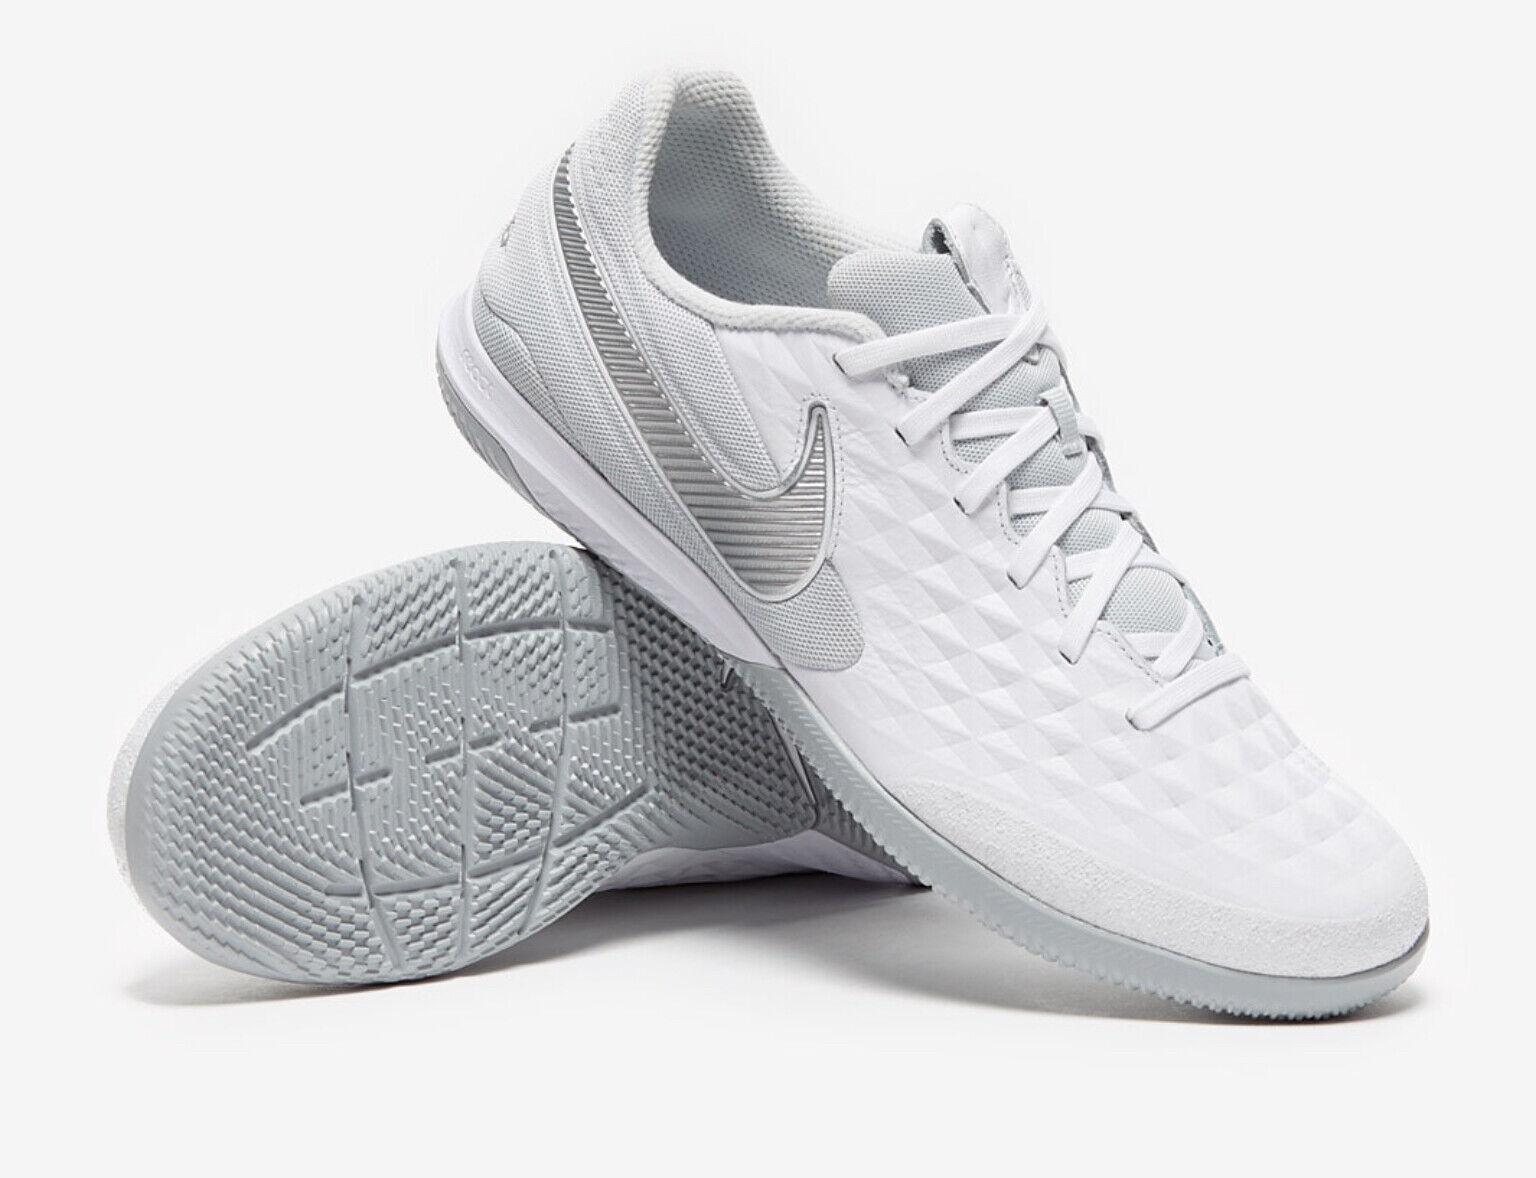 Nike React Legend 8 PRO IC - AT6134 100